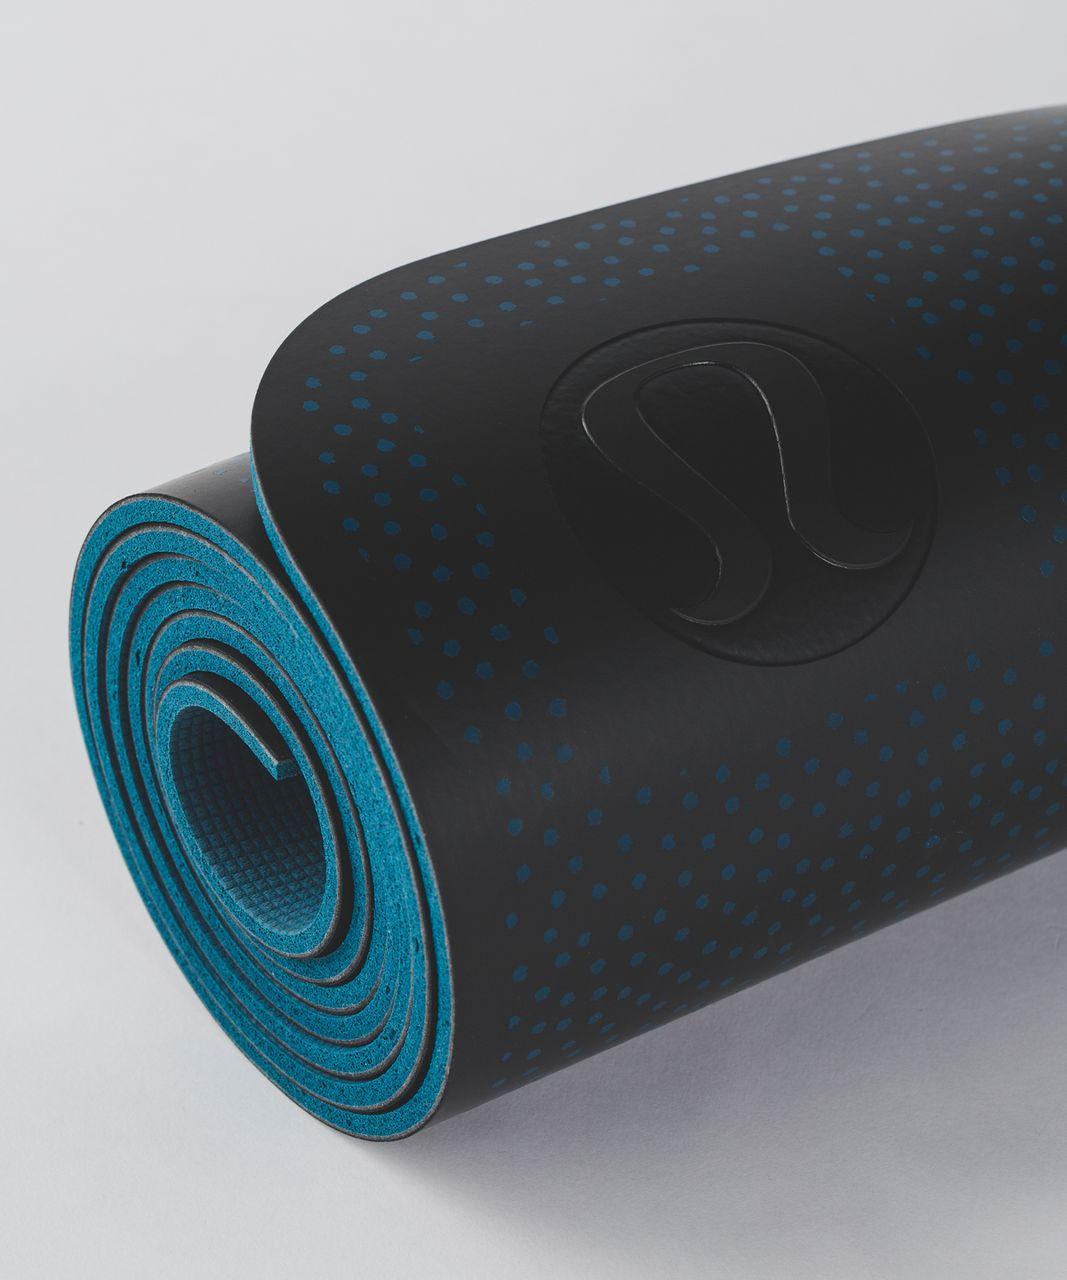 Lululemon The Reversible Mat 5mm Frozen Fizz Capri Black